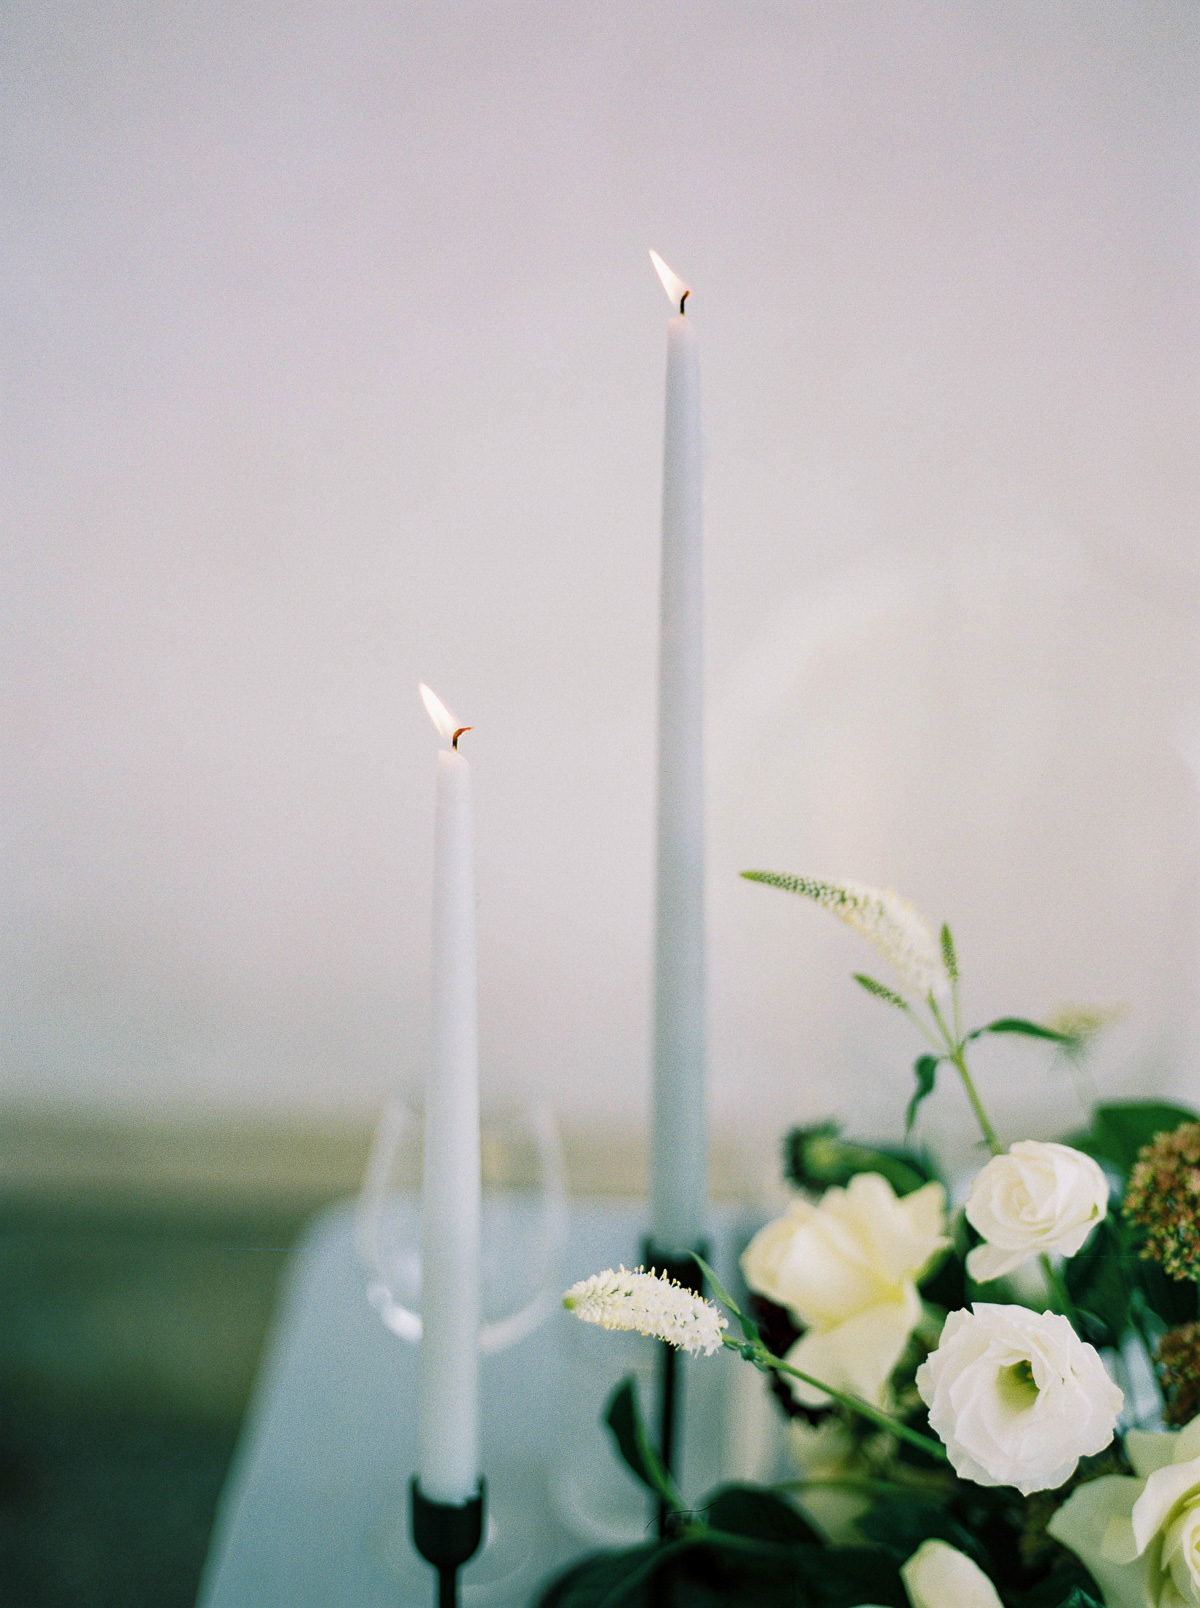 kurtz-orpia-photography-vineyard-bride-swish-list-dundurn-castle-dundas-wedding-editorial-30.jpg